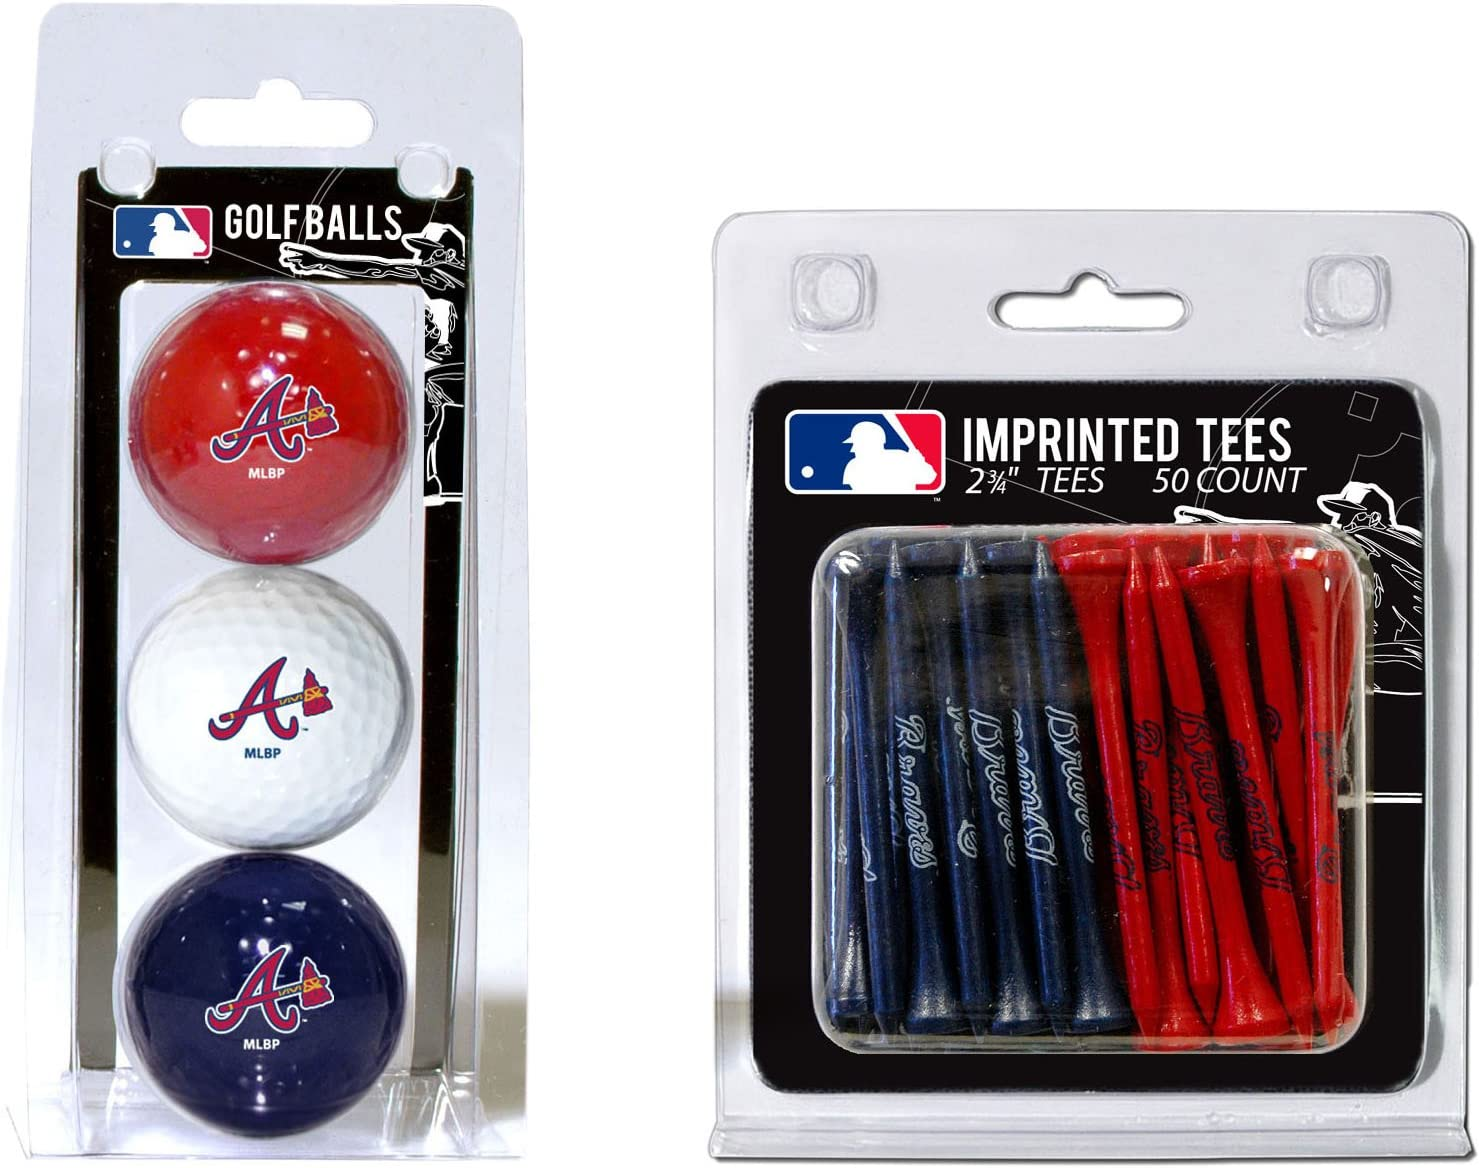 "Team Golf MLB Atlanta Braves Logo Imprinted Golf Balls (3 Count) & 2-3/4"" Regulation Golf Tees (50 Count), Multi Colored : Sports Fan Golf Balls : Sports & Outdoors"